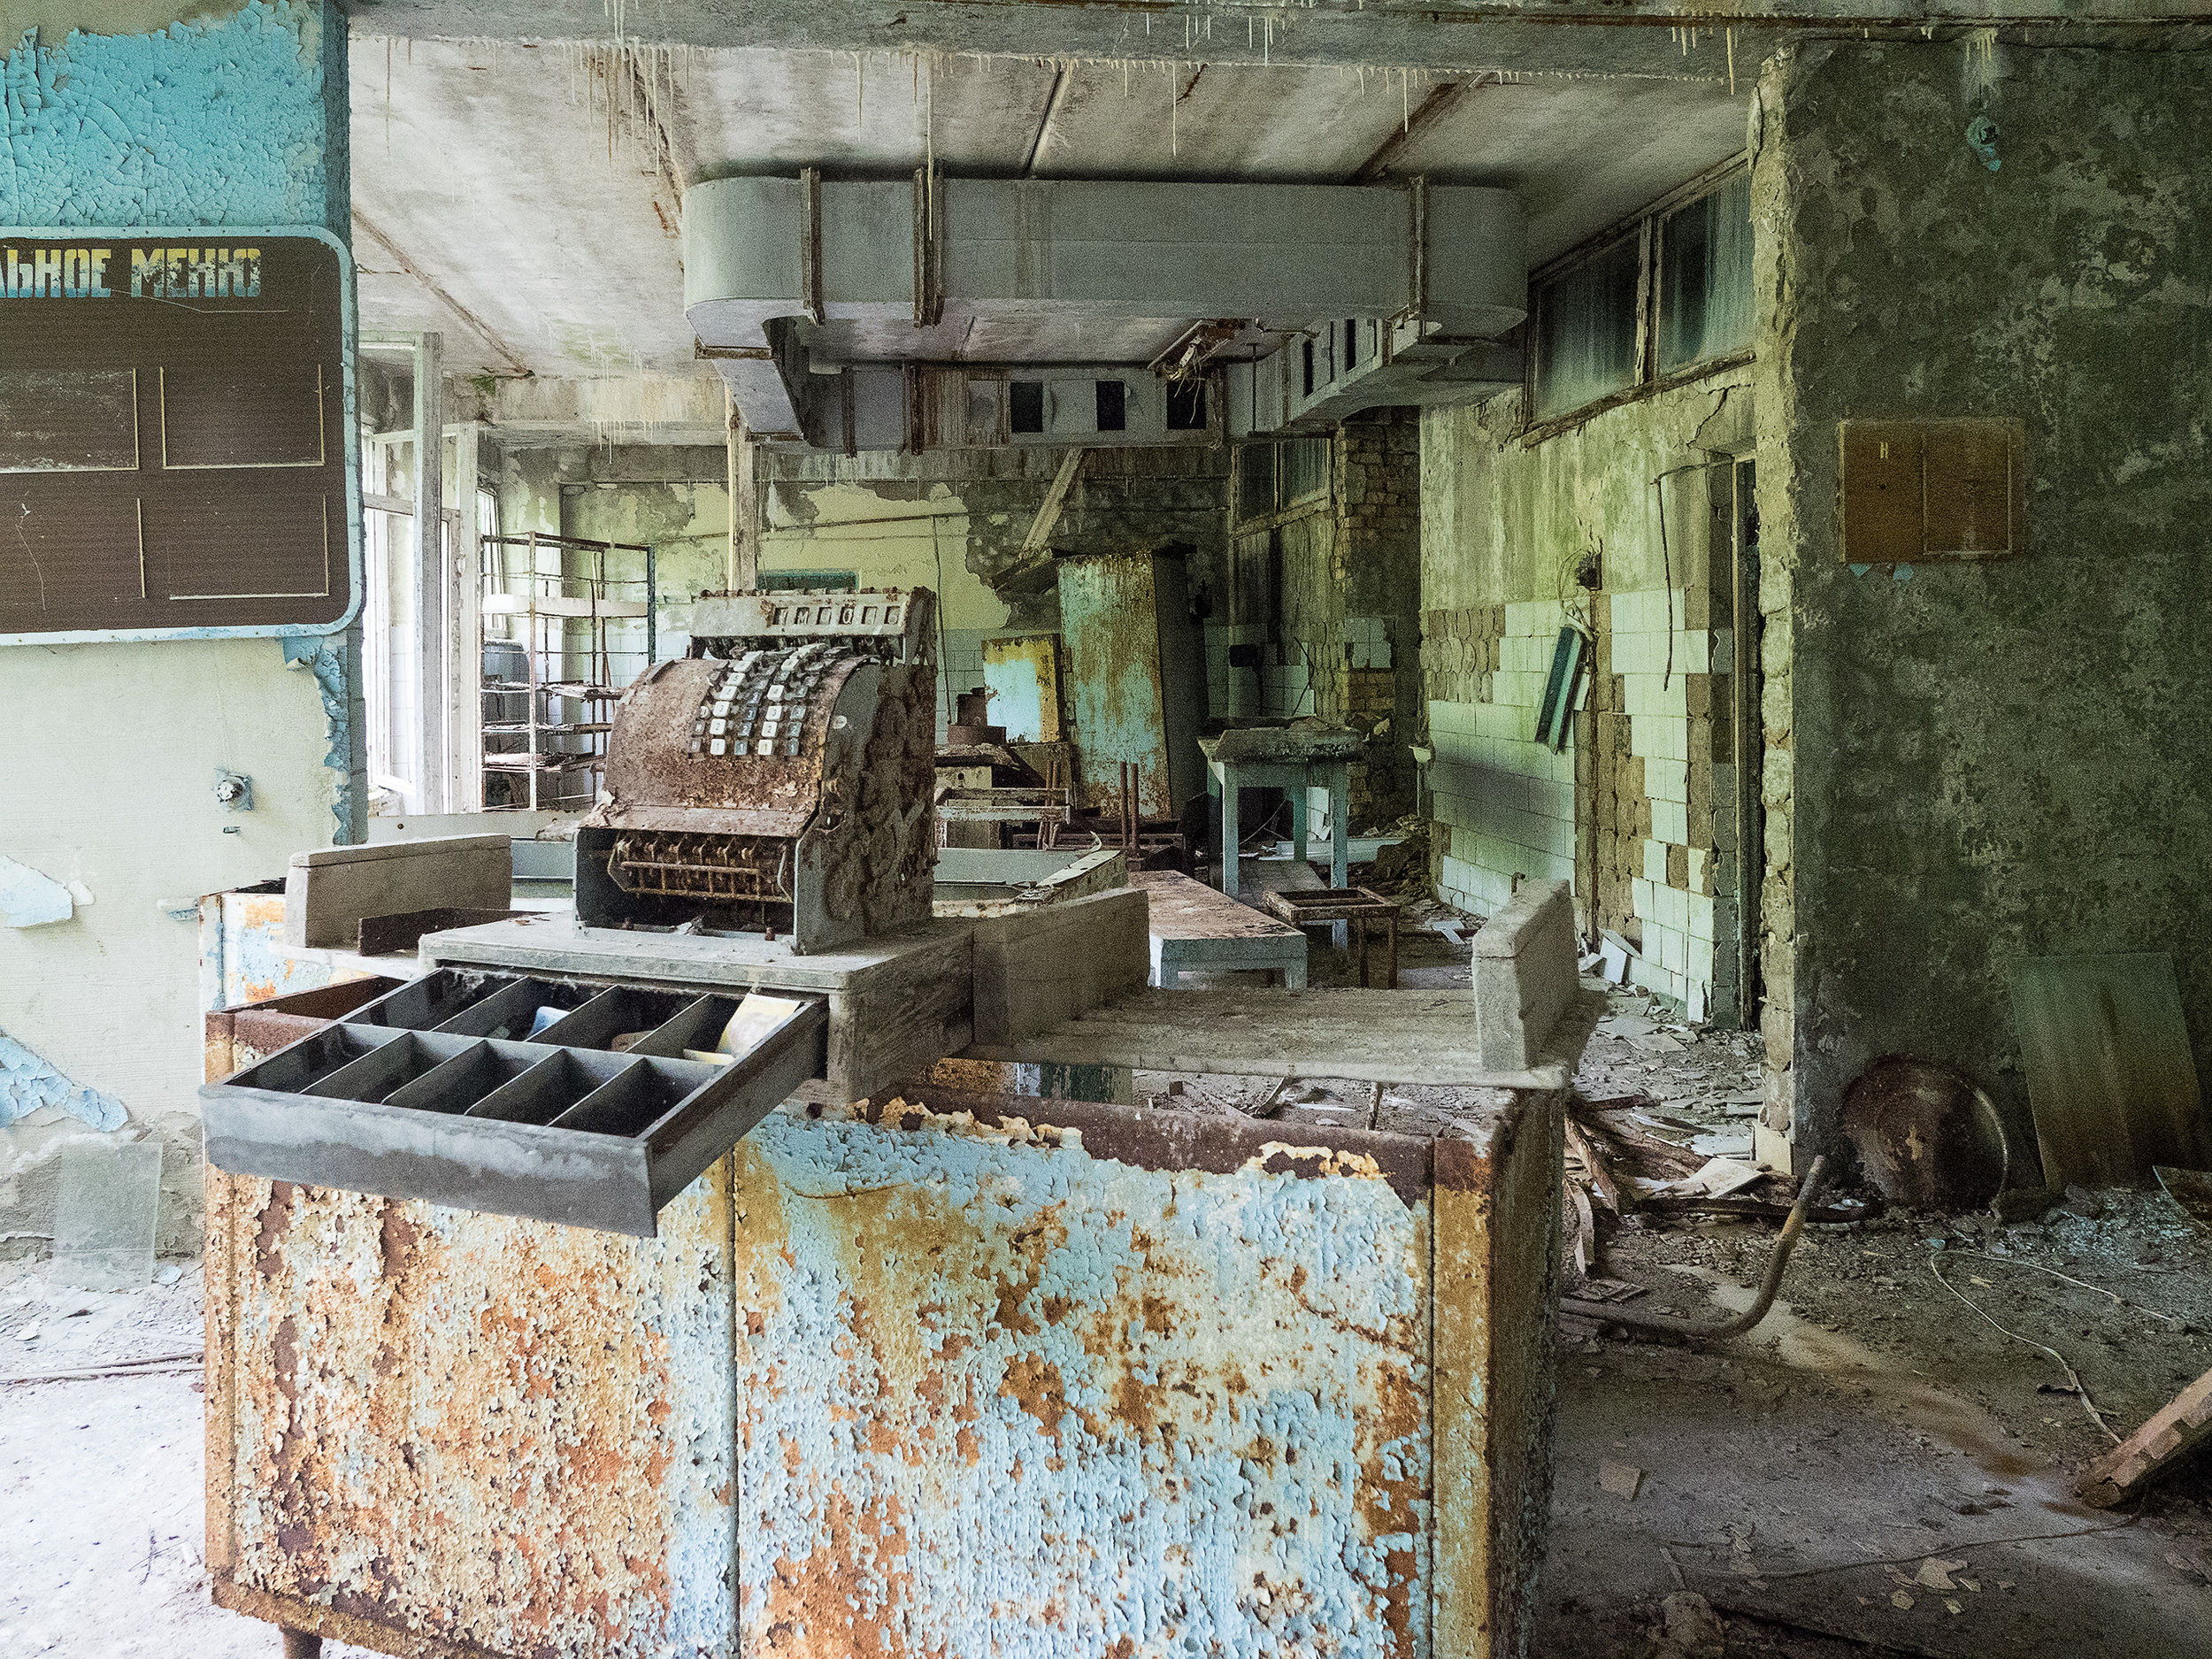 Prybet / Tschernobyl by Eric Berger